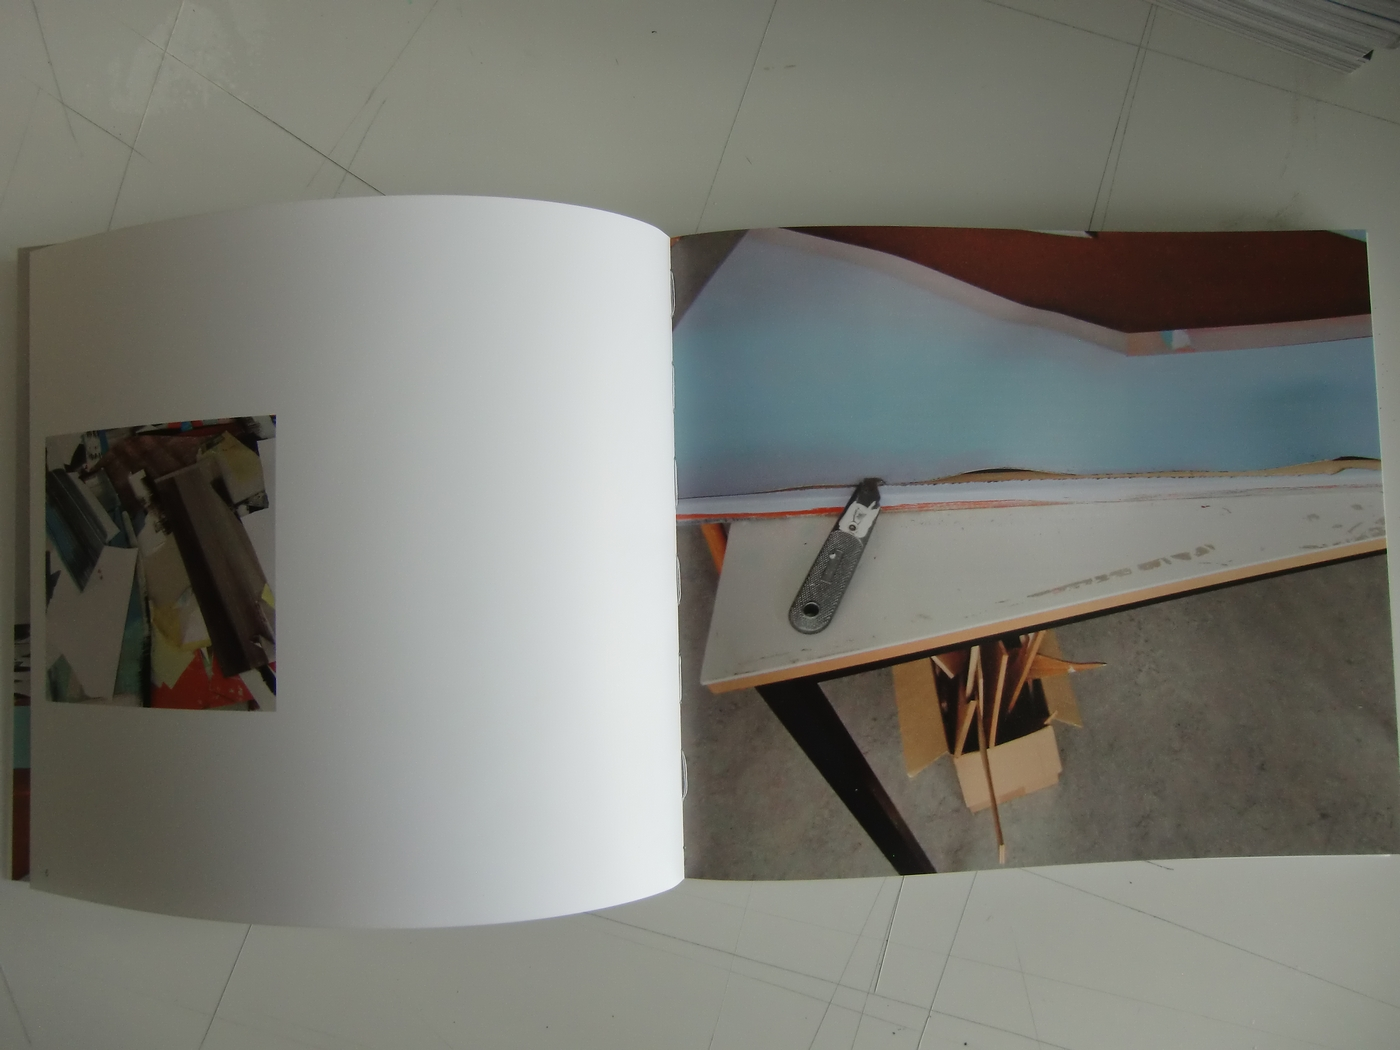 Oscar Lourens concept & design, drukkerij Tienkamp lithography & print